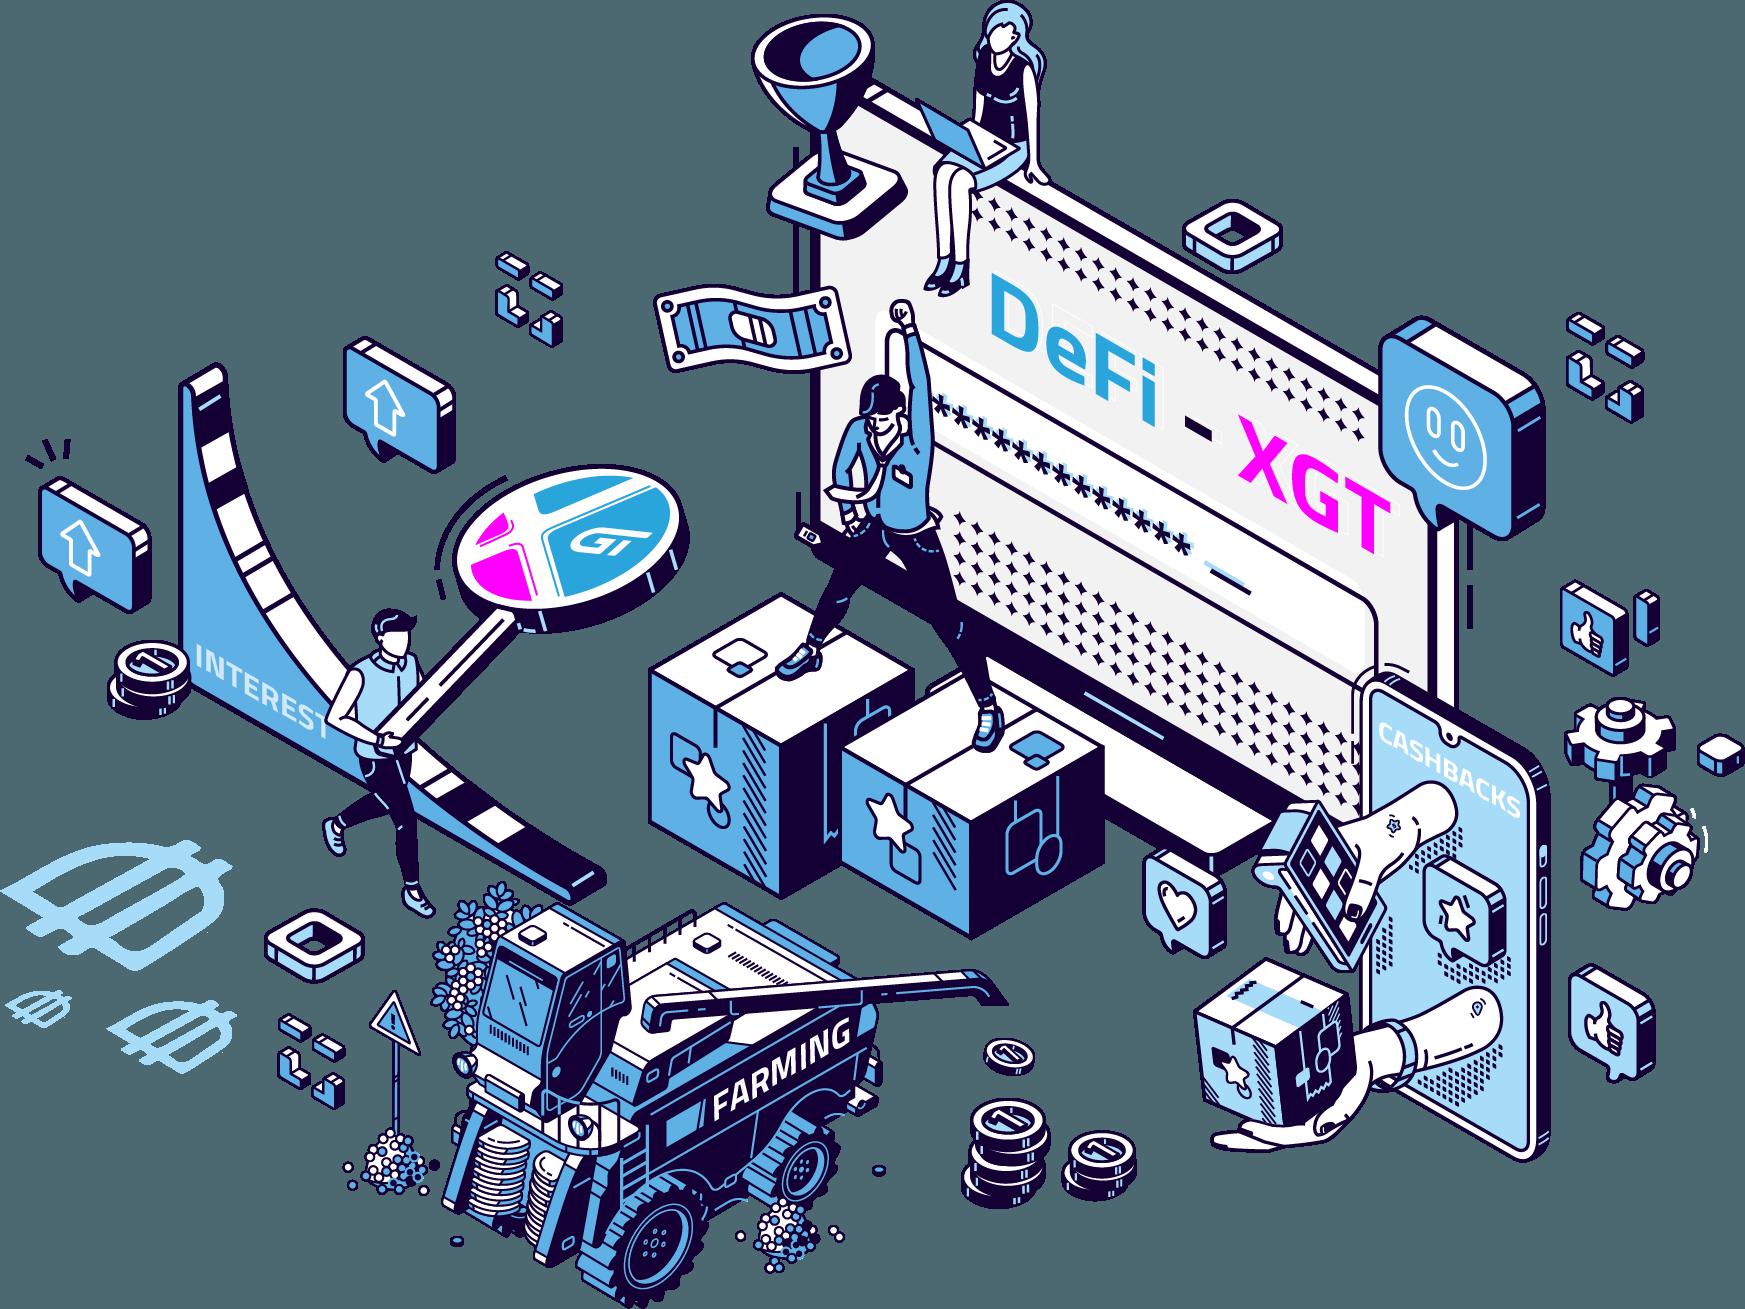 Defi -XGT - Xion Global